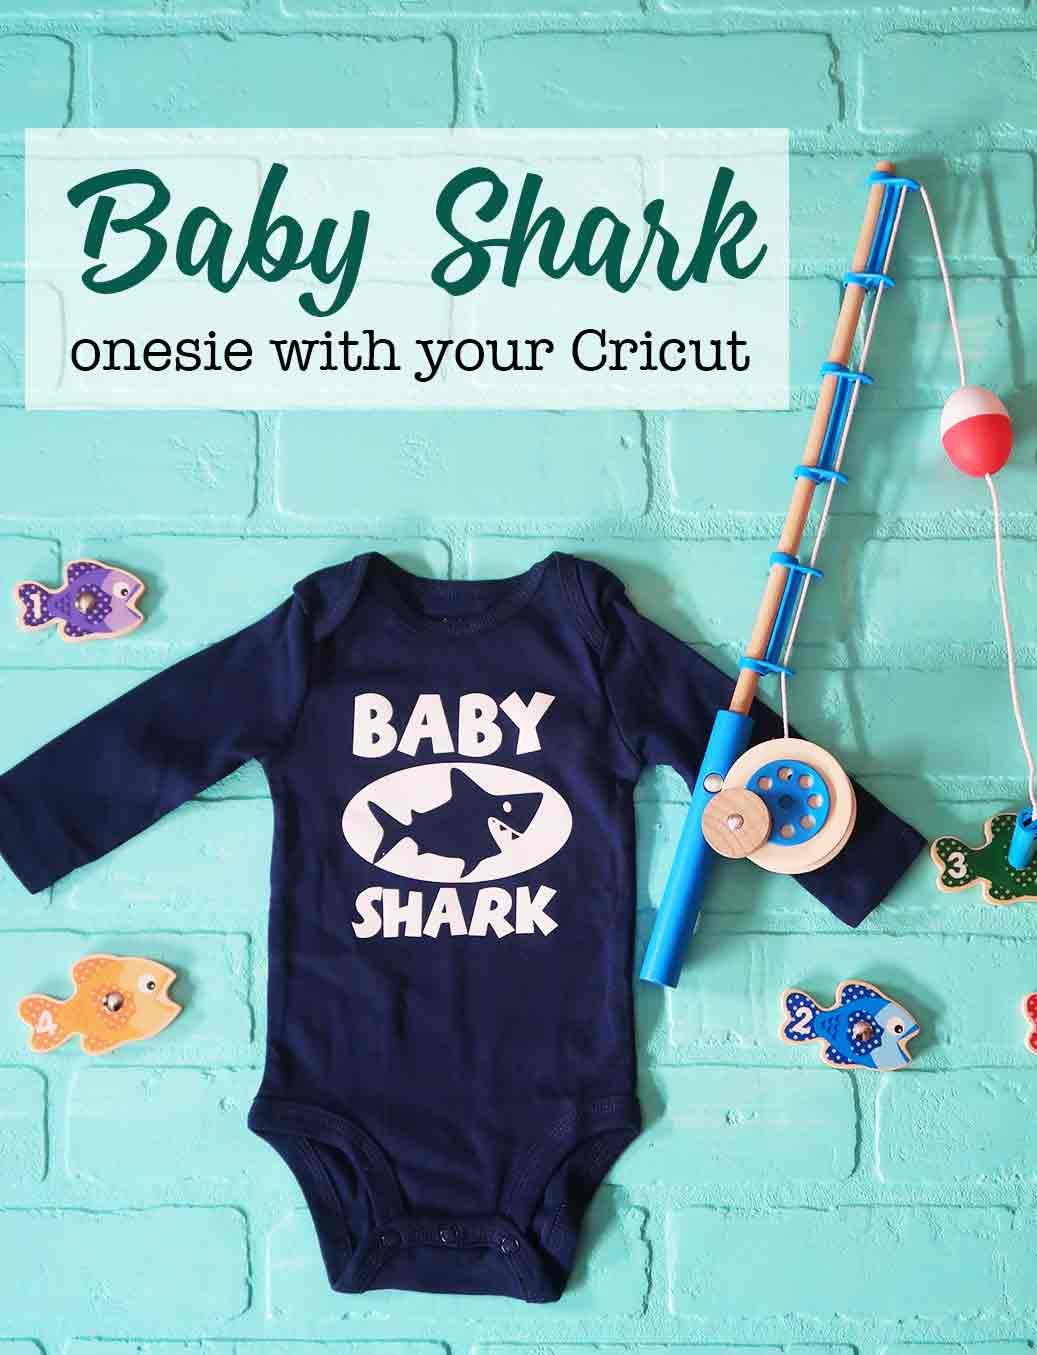 Baby_shark_onesie.jpg